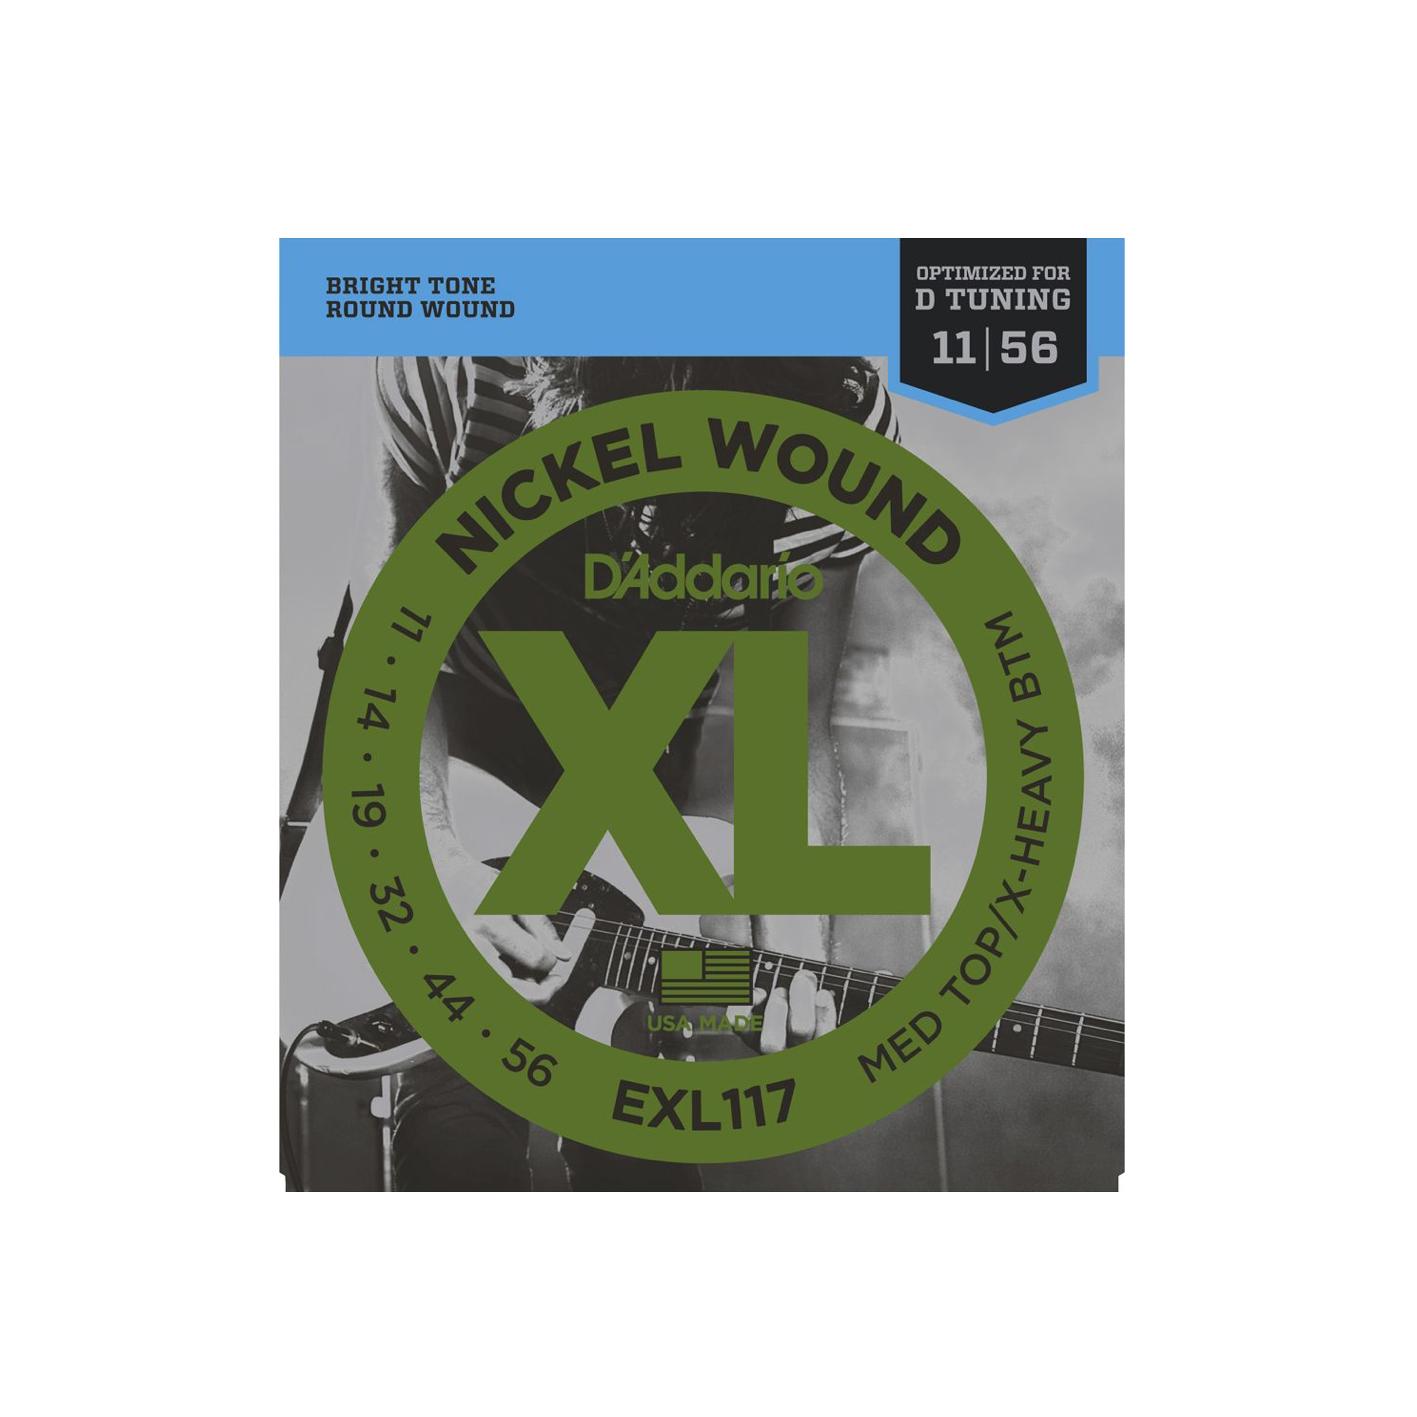 D'Addario XL Electric Guitar Strings (Various Gauges)